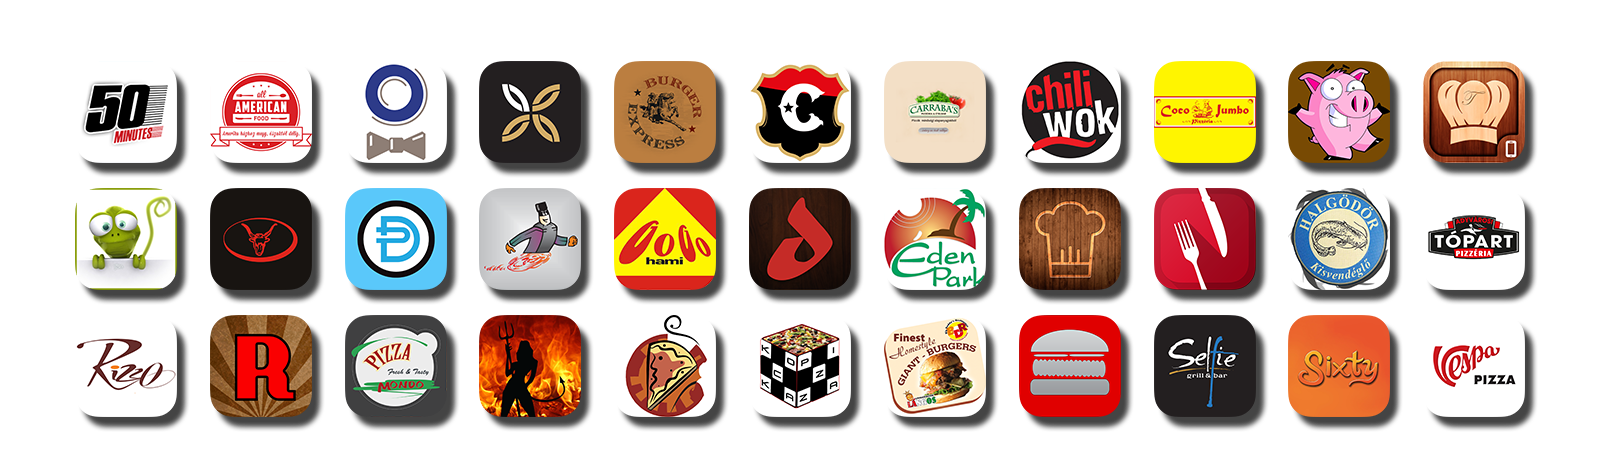 éttermi mobil app ikonok